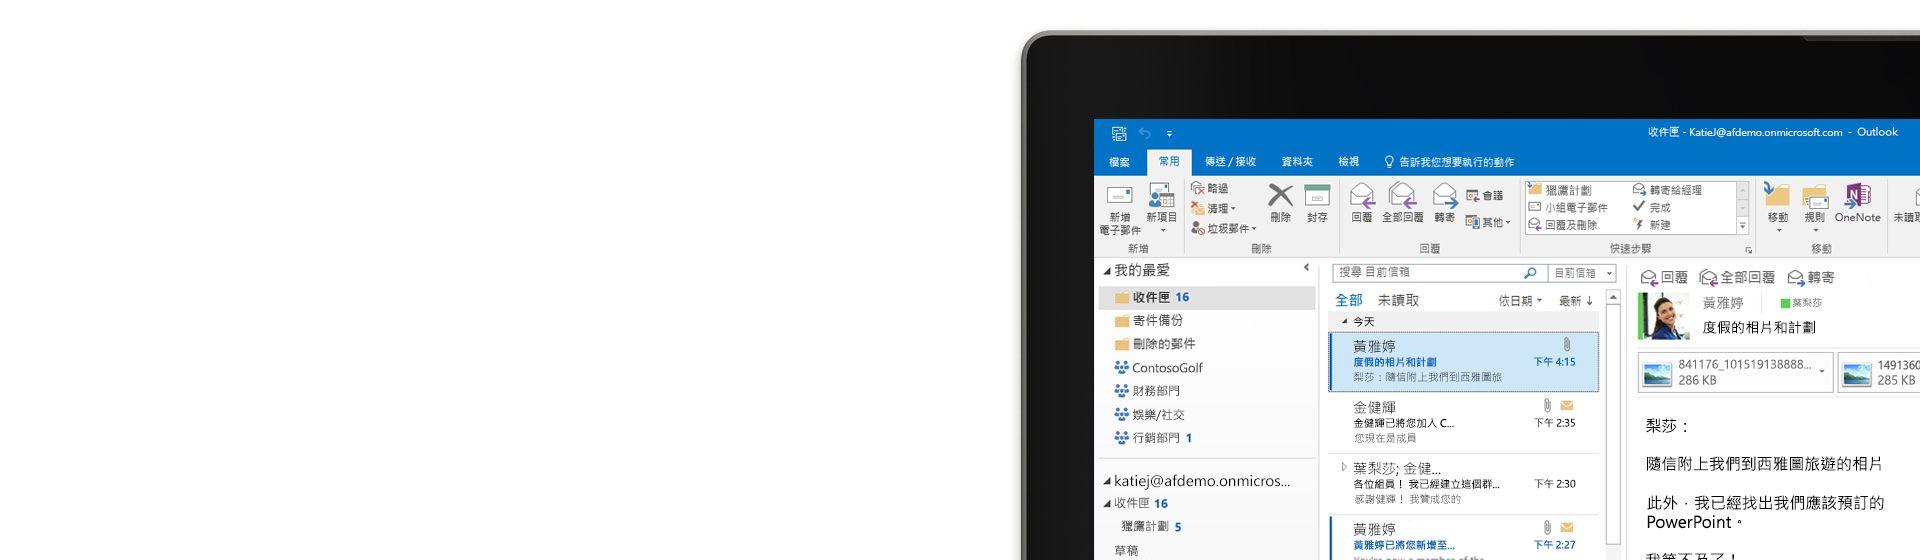 Microsoft Outlook 電腦版的部分檢視畫面